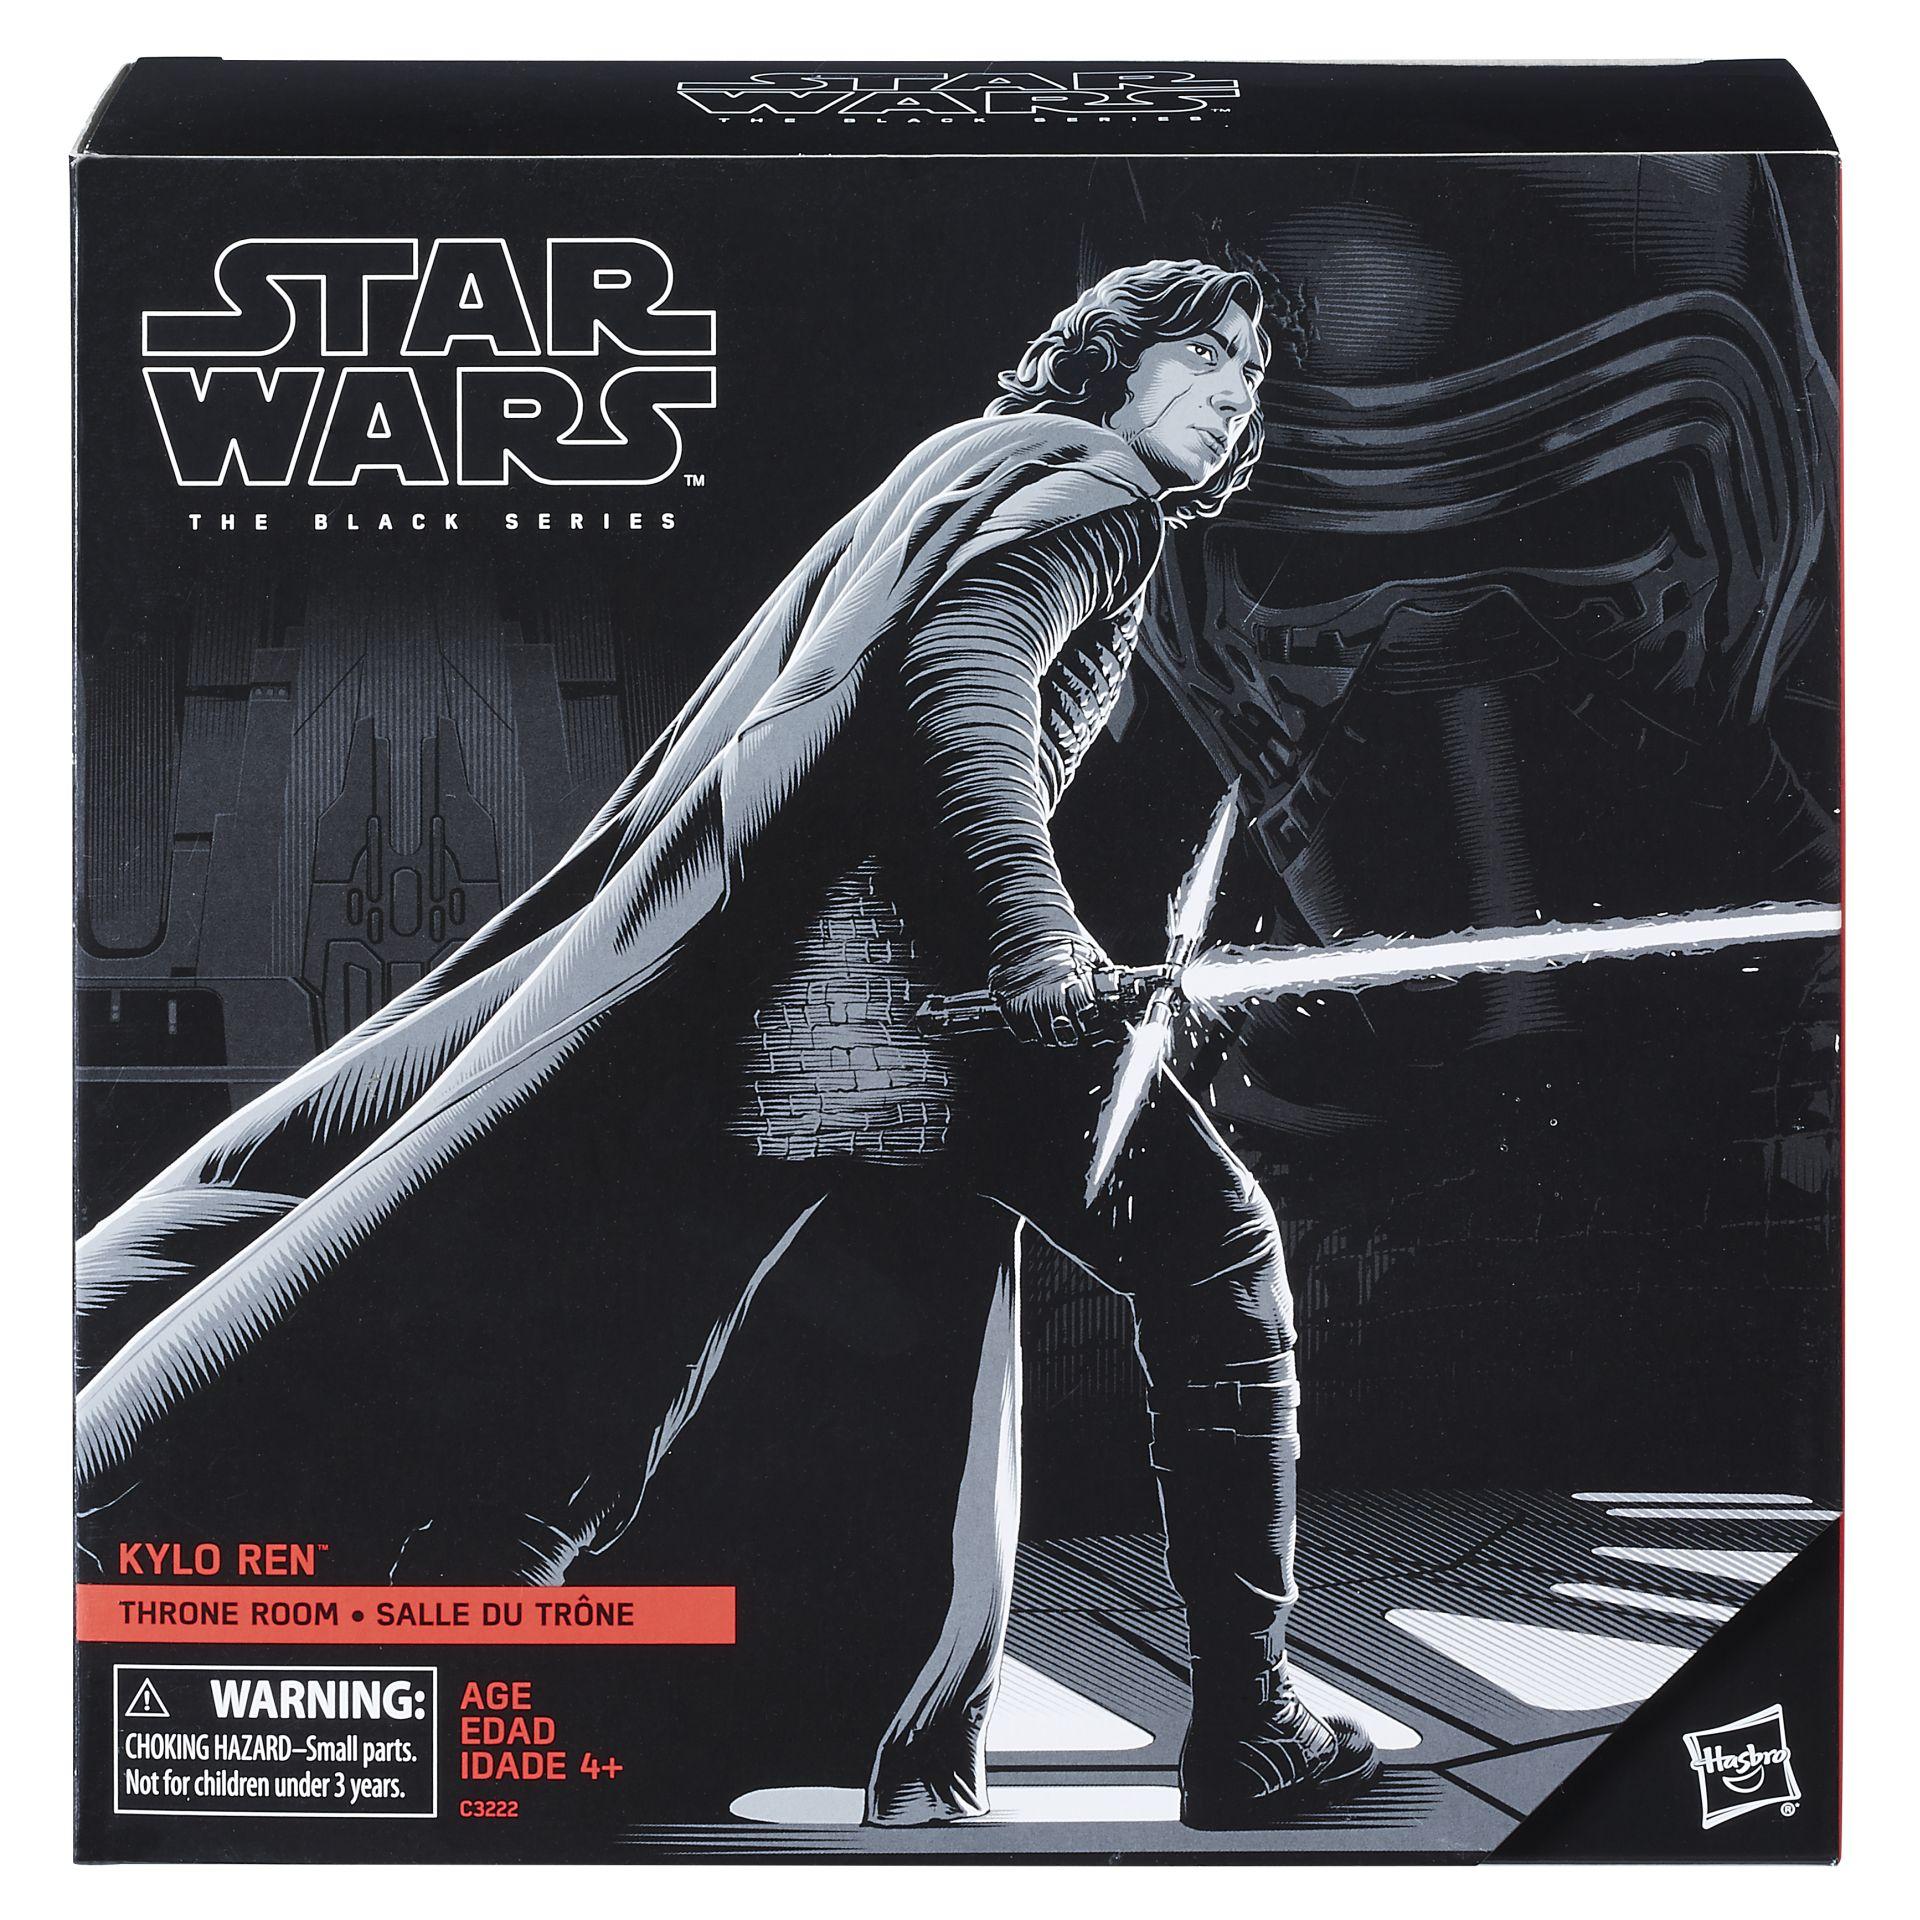 Hasbro Shares Star Wars Black Series Details for Force ...